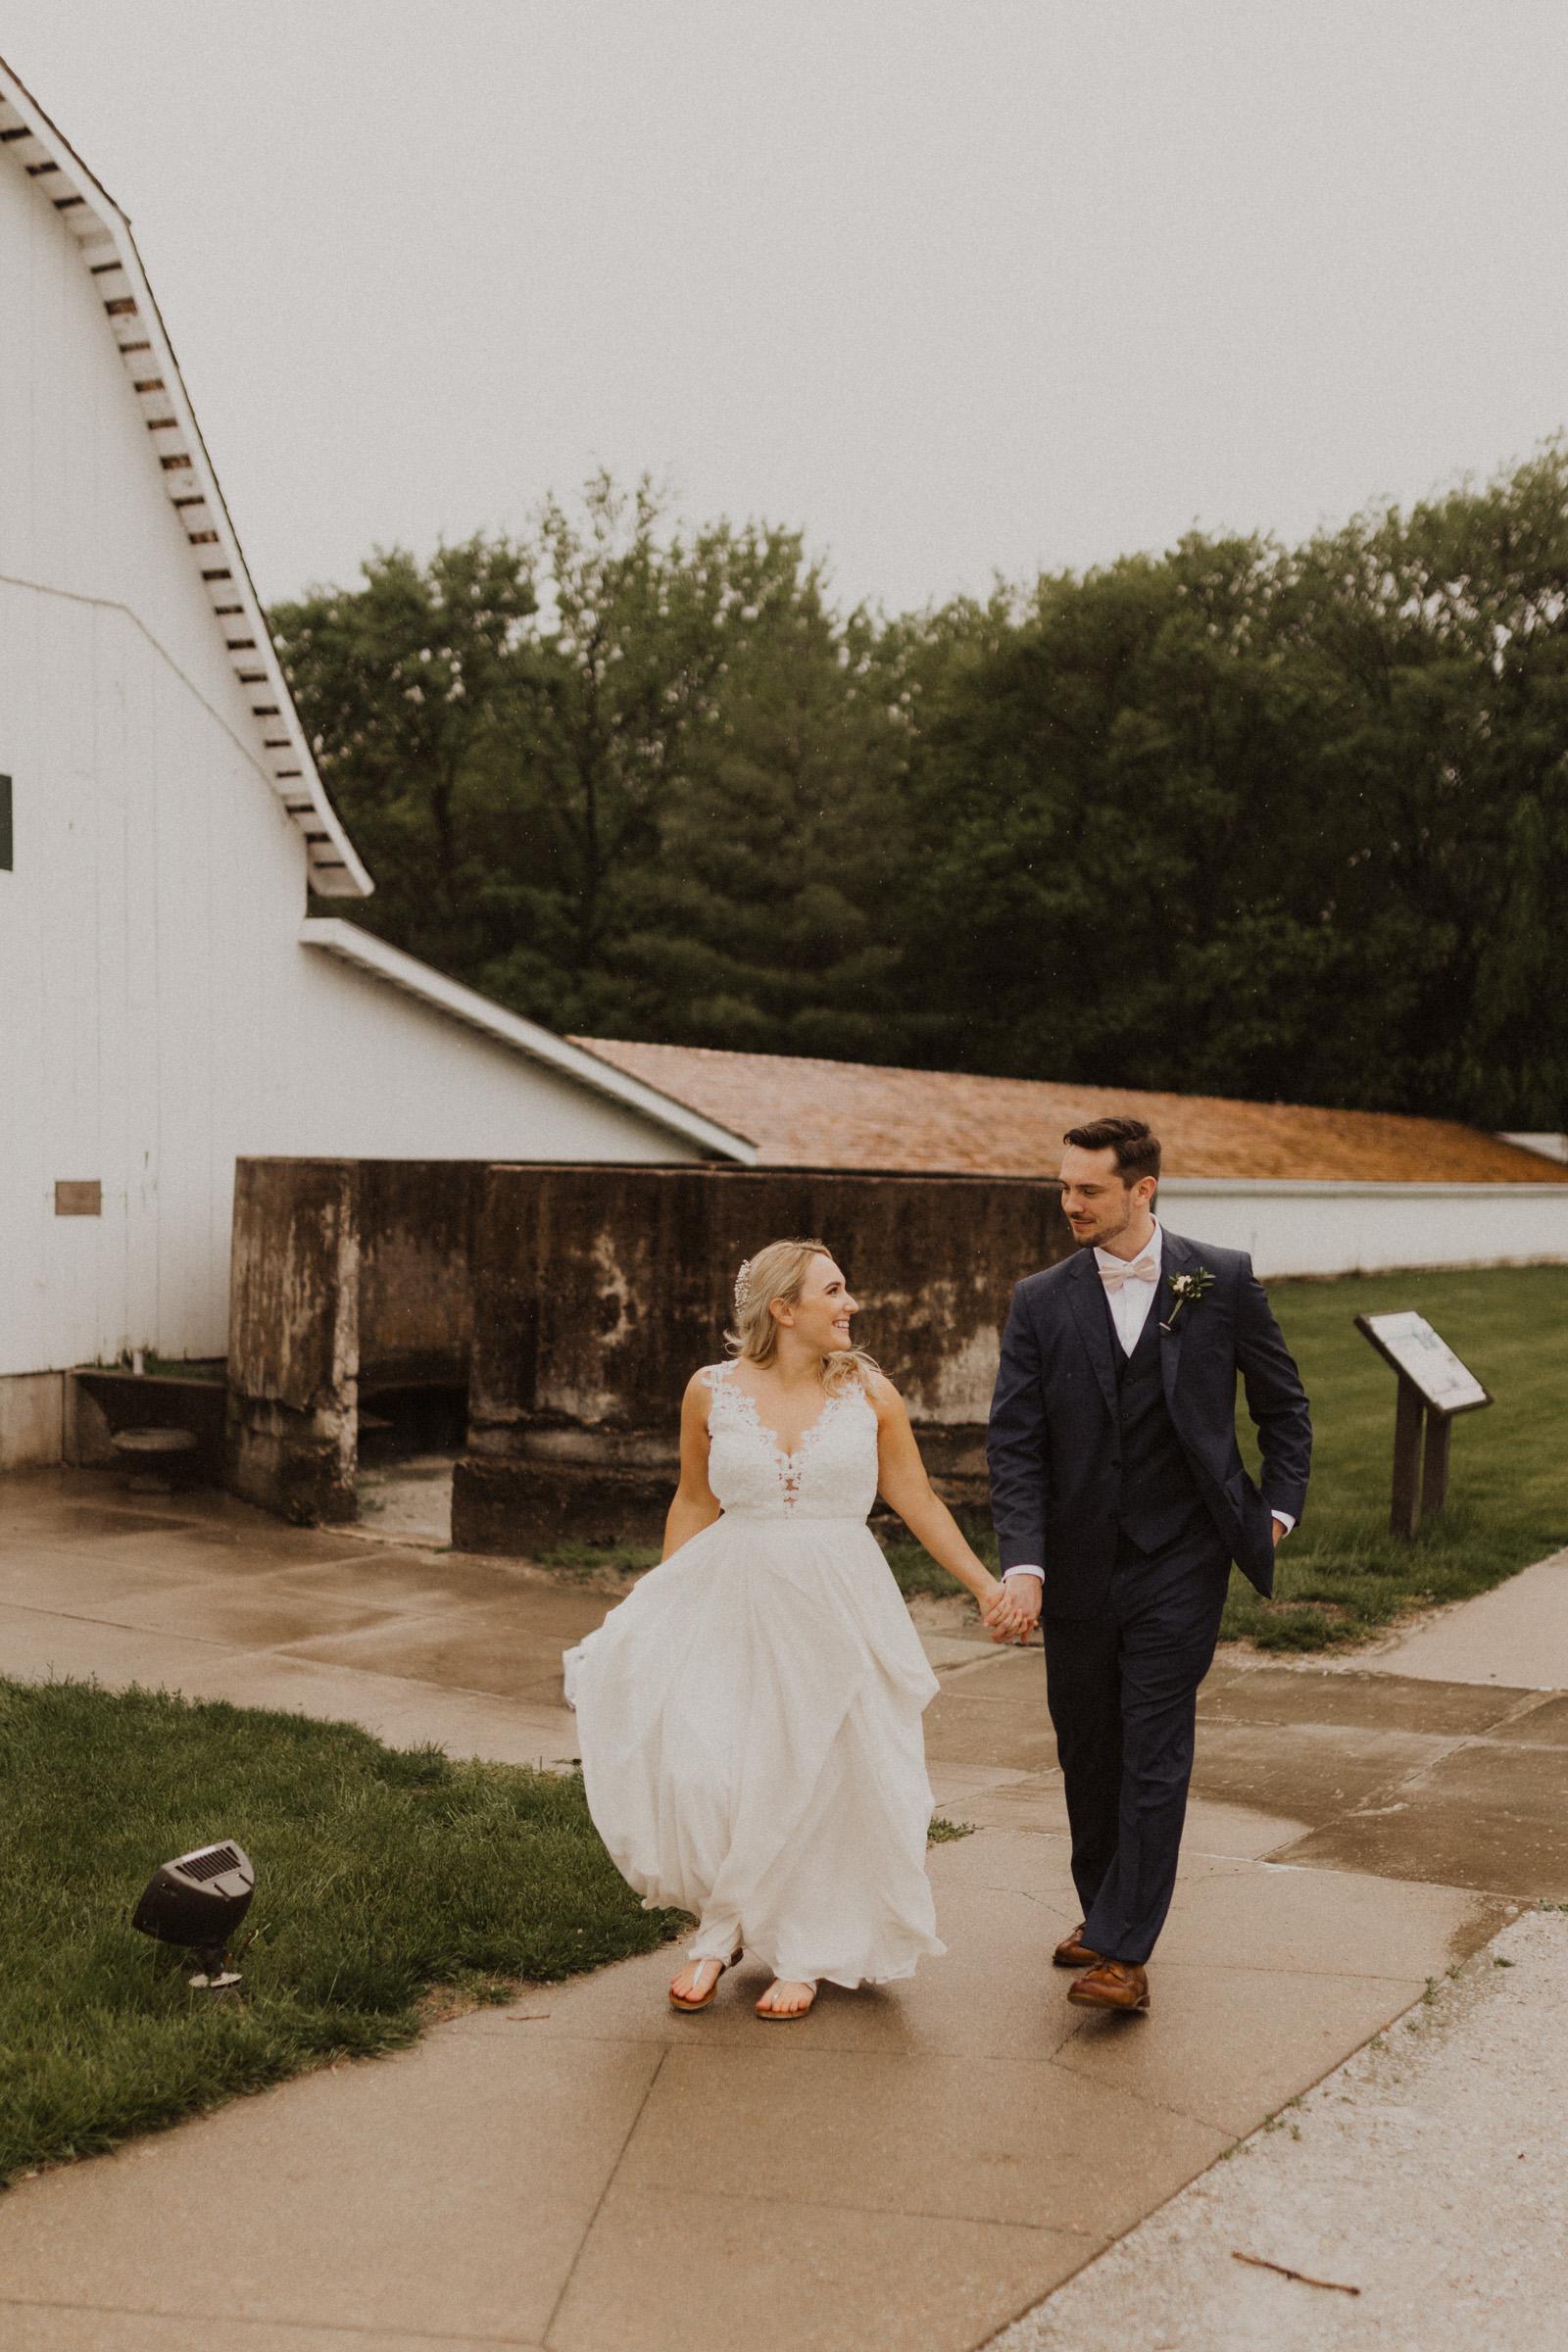 alyssa barletter photography nelson wedding nebraska city lied lodge morton barn spring wedding photographer-45.jpg